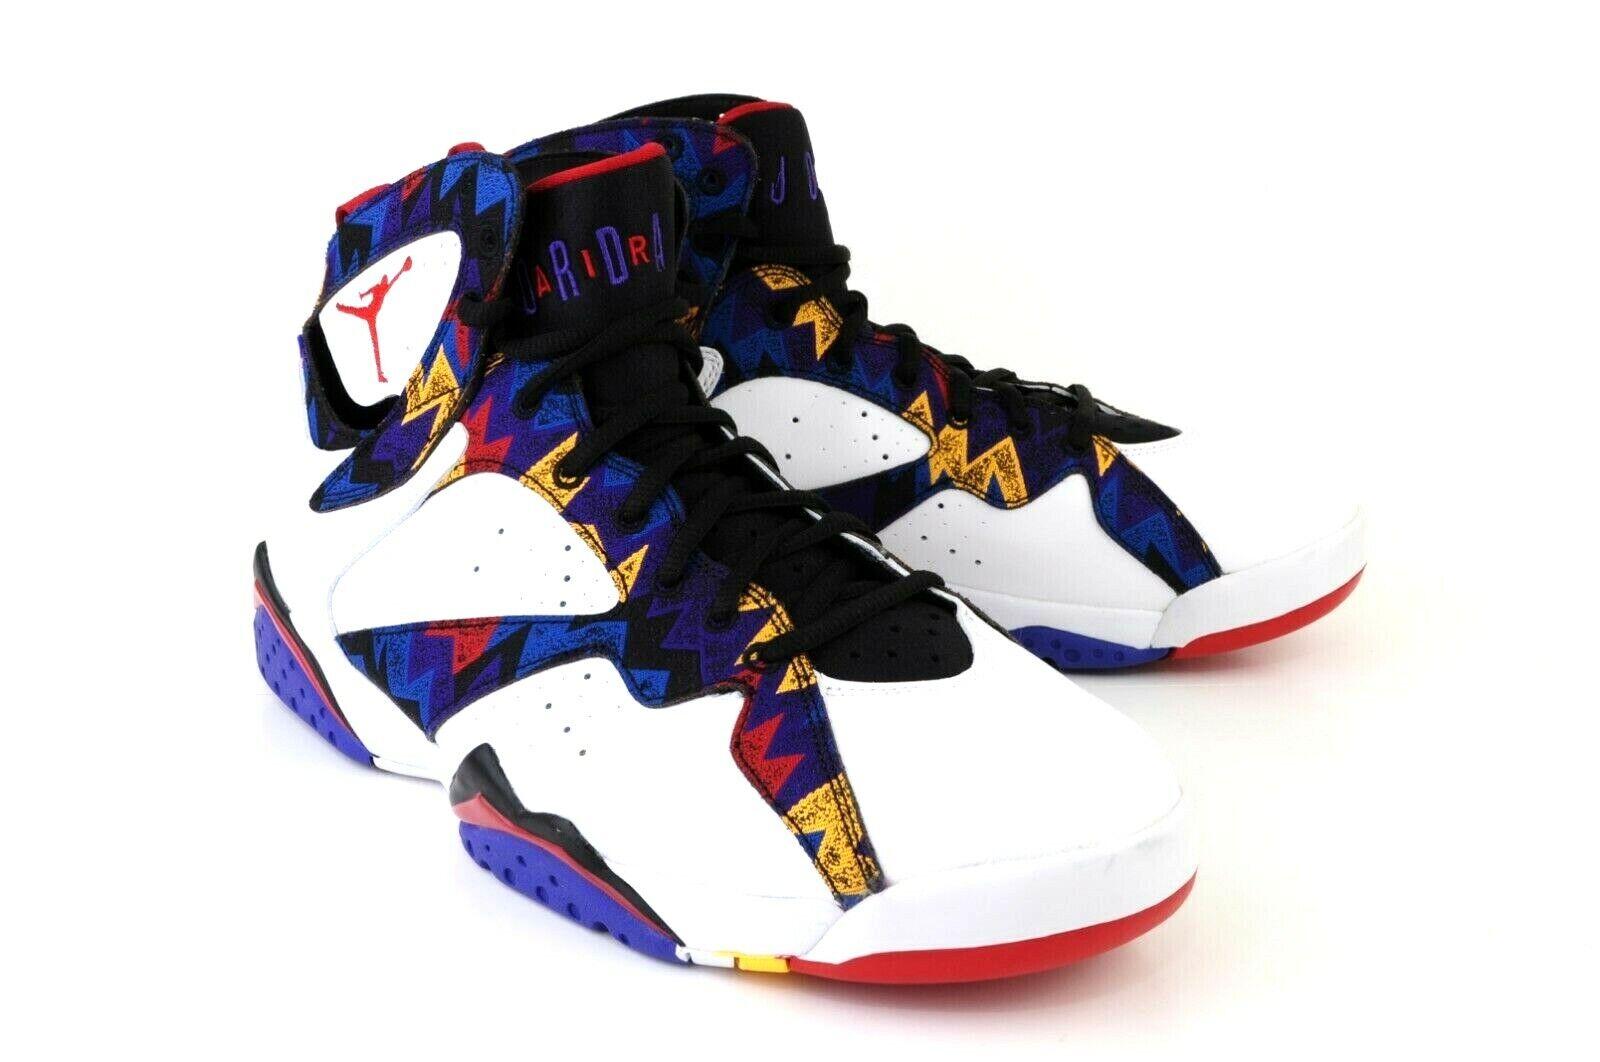 Nike Air Jordan 7 Mens SZ 12 White University Red-Black Sweater shoes 304775-142